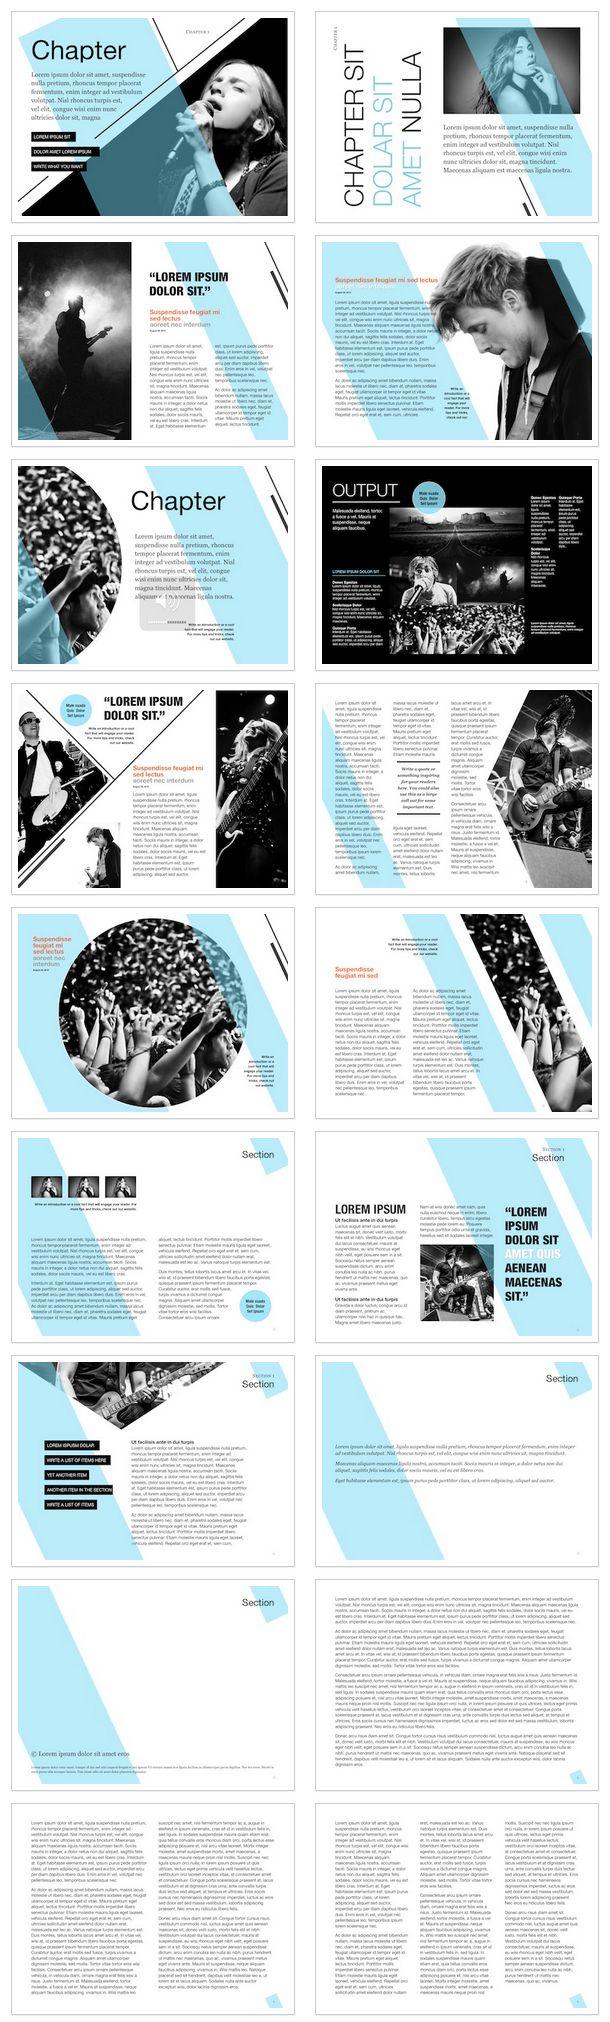 Ibook Author template | design | Pinterest